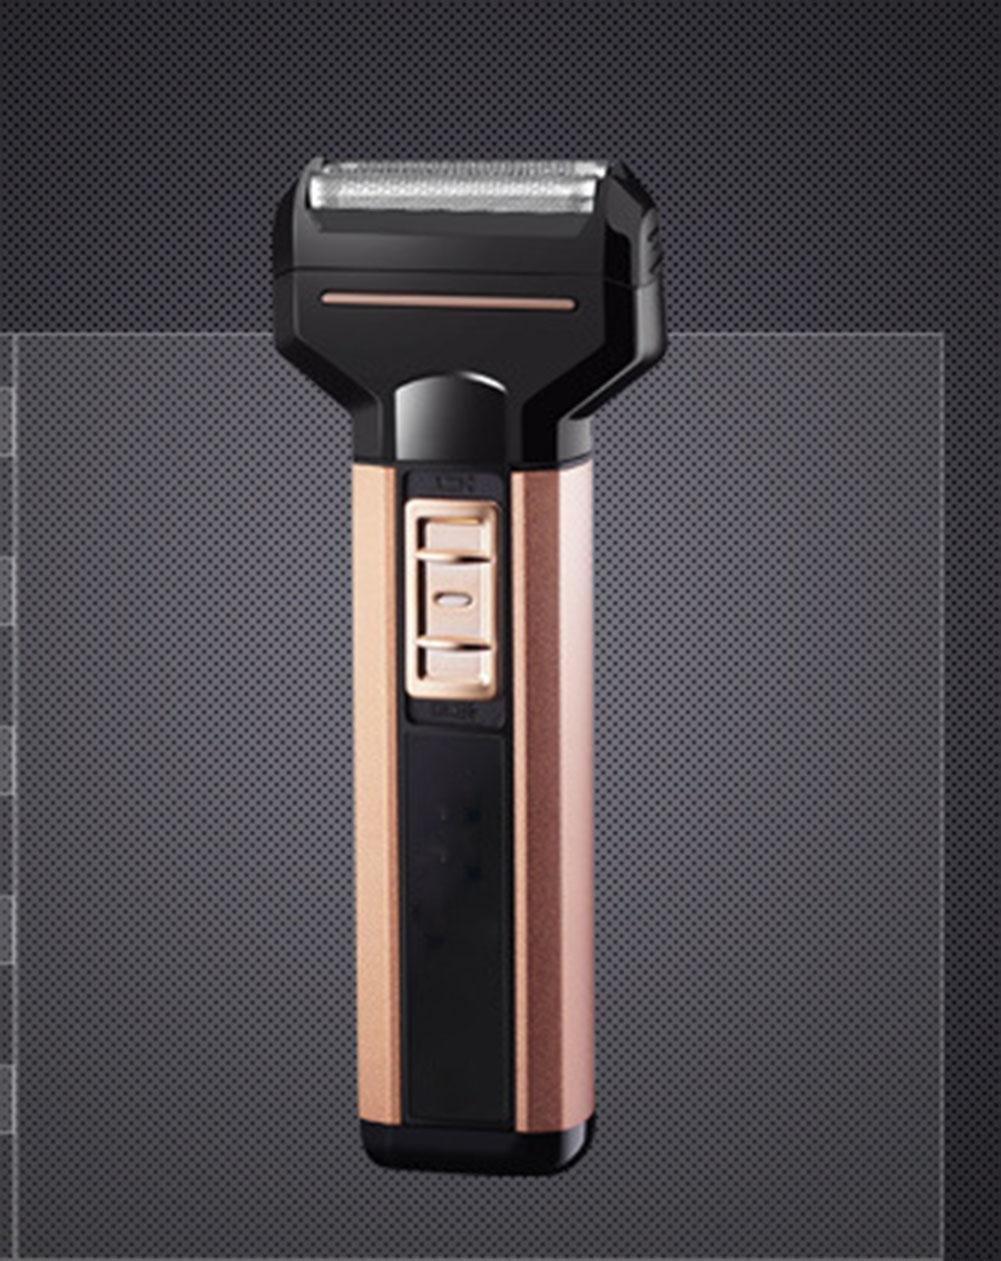 Duplex-Rasierer Nase Haar Gerät Taschenlampe Barbier Ladegerät Typ Reparatur Tempel multifunktionale Anzug